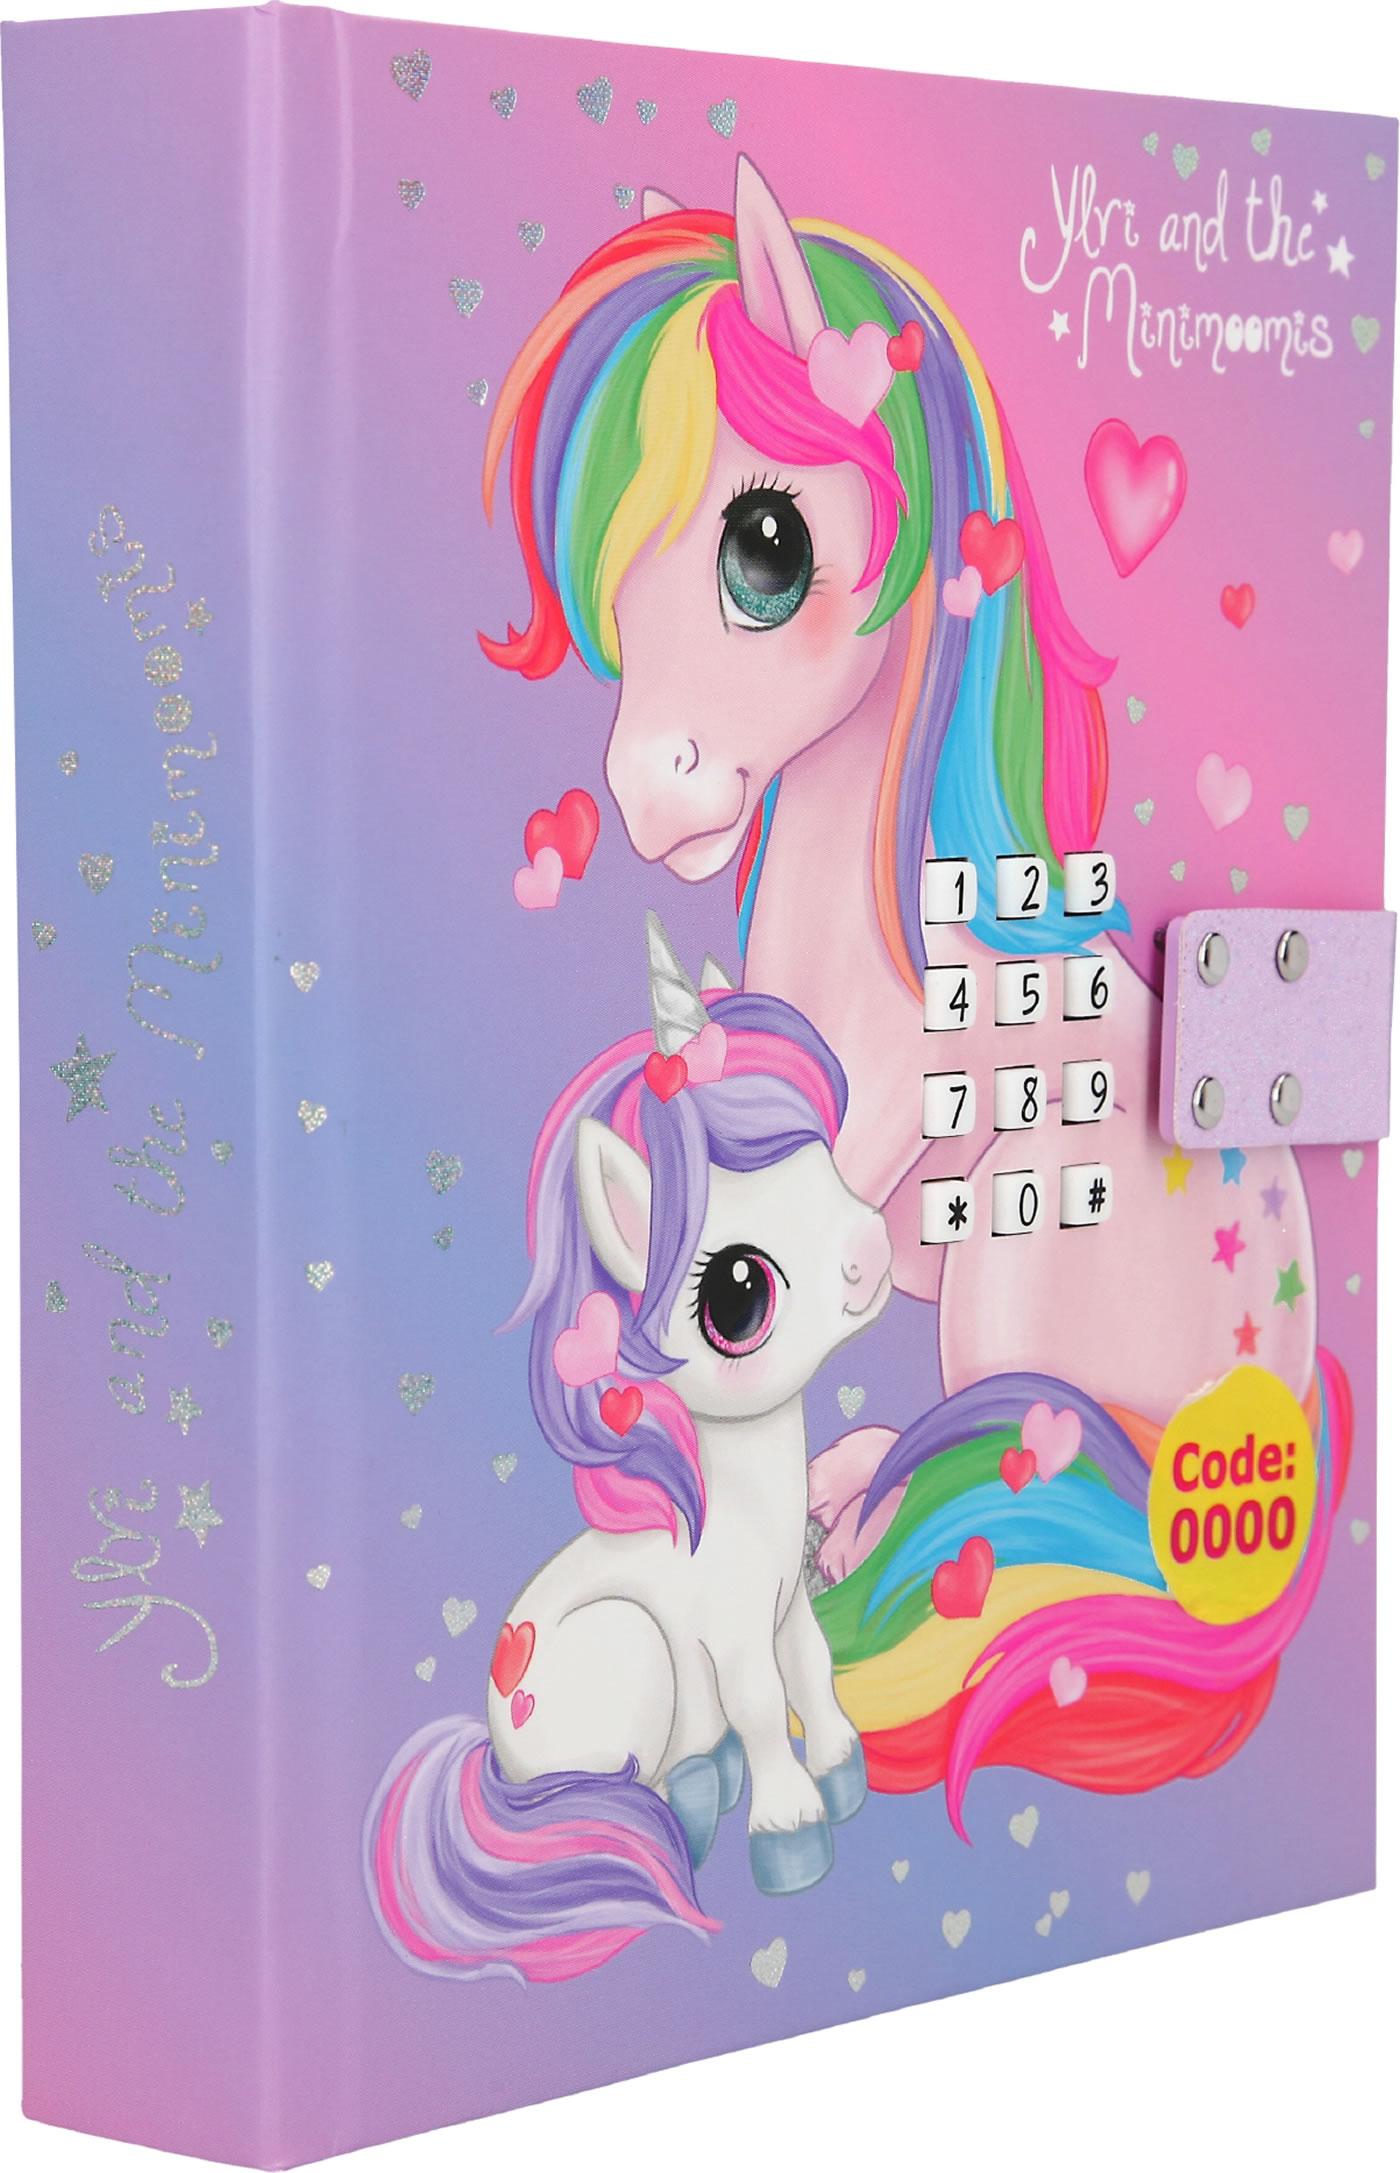 Ylvi and the Minimoomies diary with secret code and LED unicorn purple